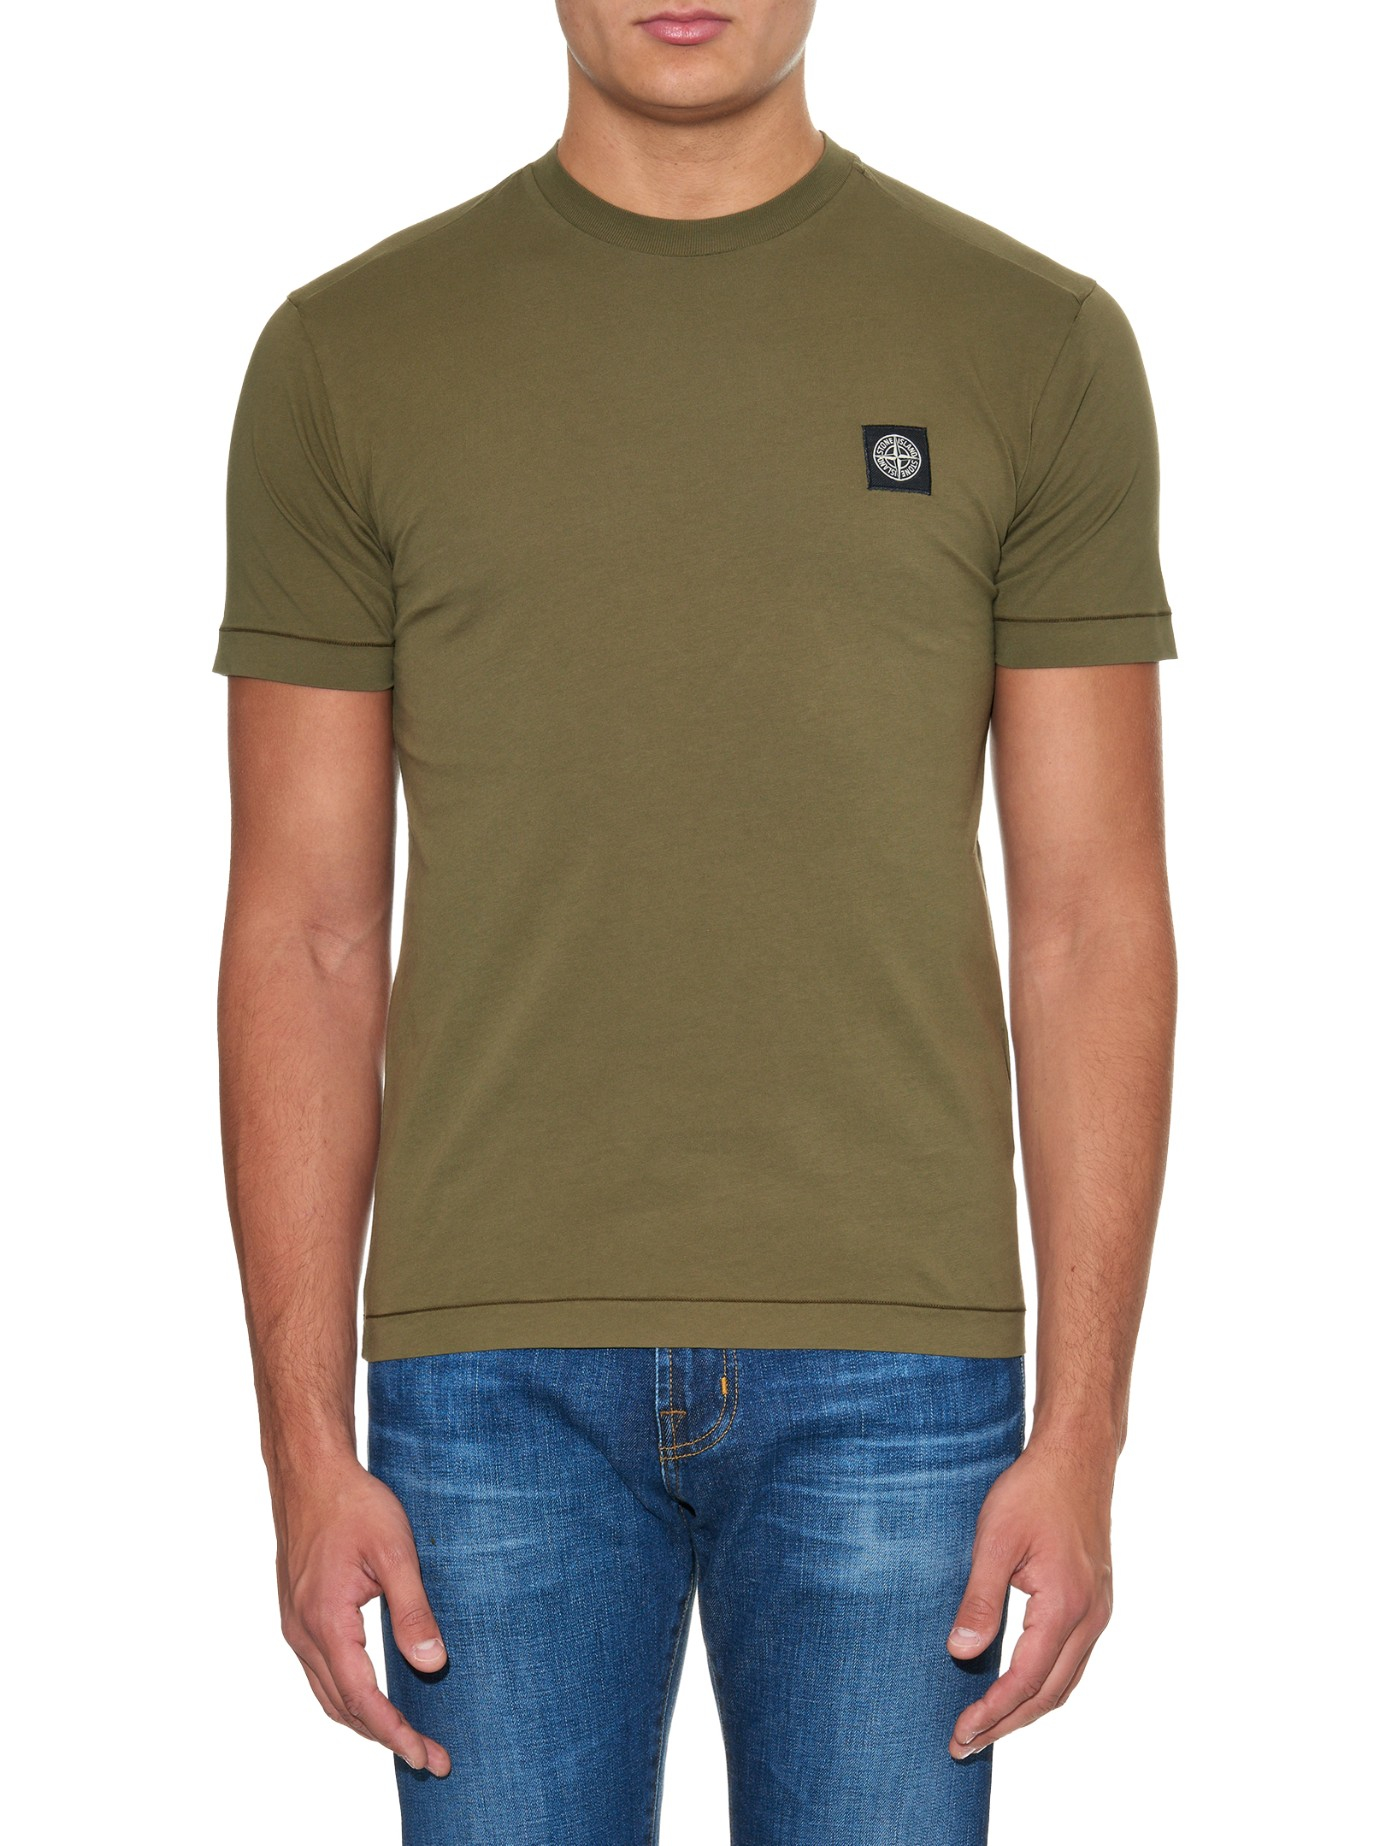 Mens Embroidered Logo Cotton Jersey T-Shirt Stone Island Sale Purchase Original Online YeNJXnrm